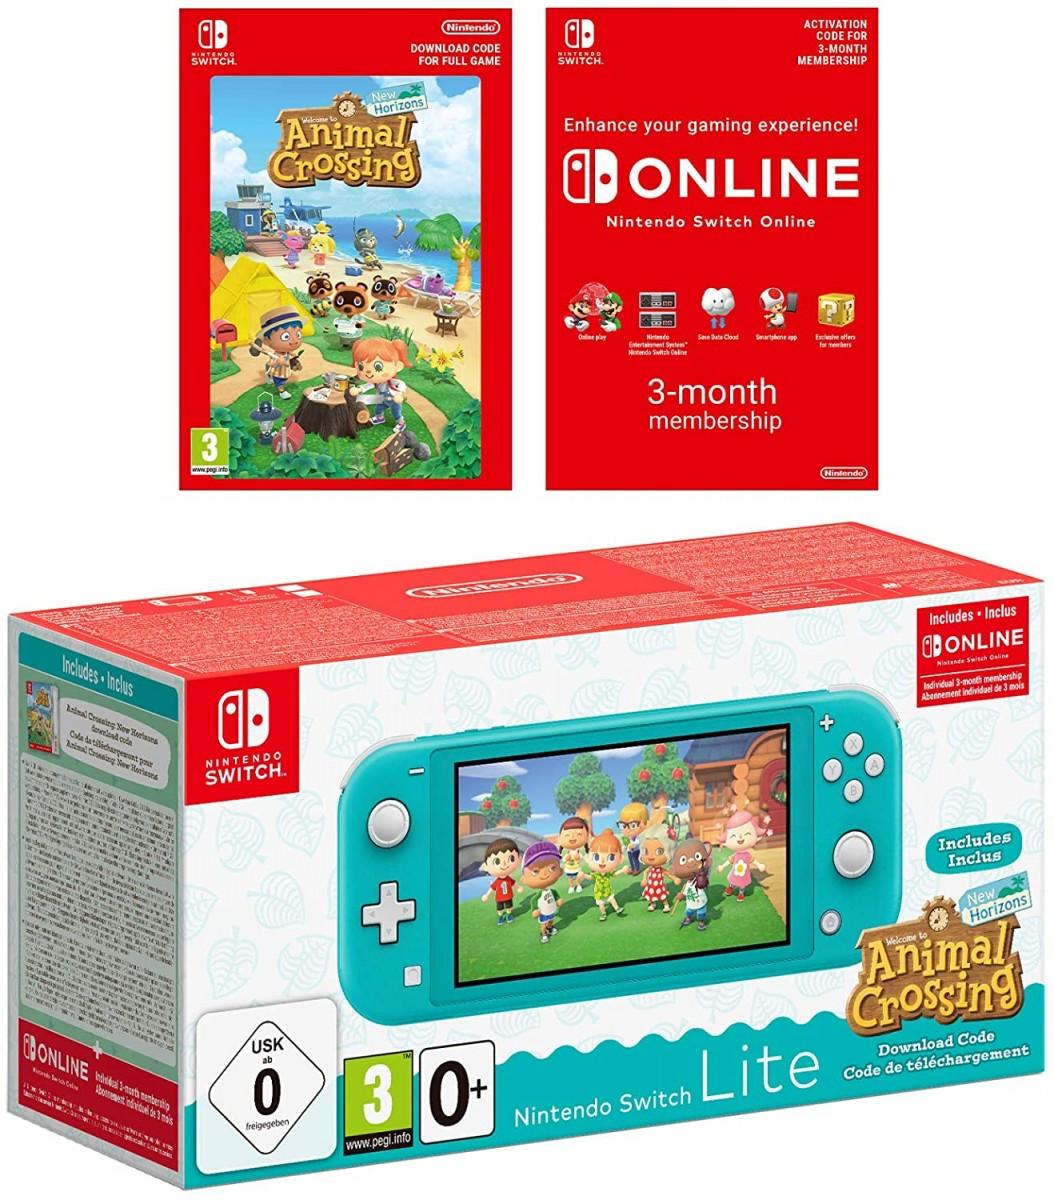 Nintendo Switch Lite (бирюзовый) + Animal Crossing + 3 м онлайн